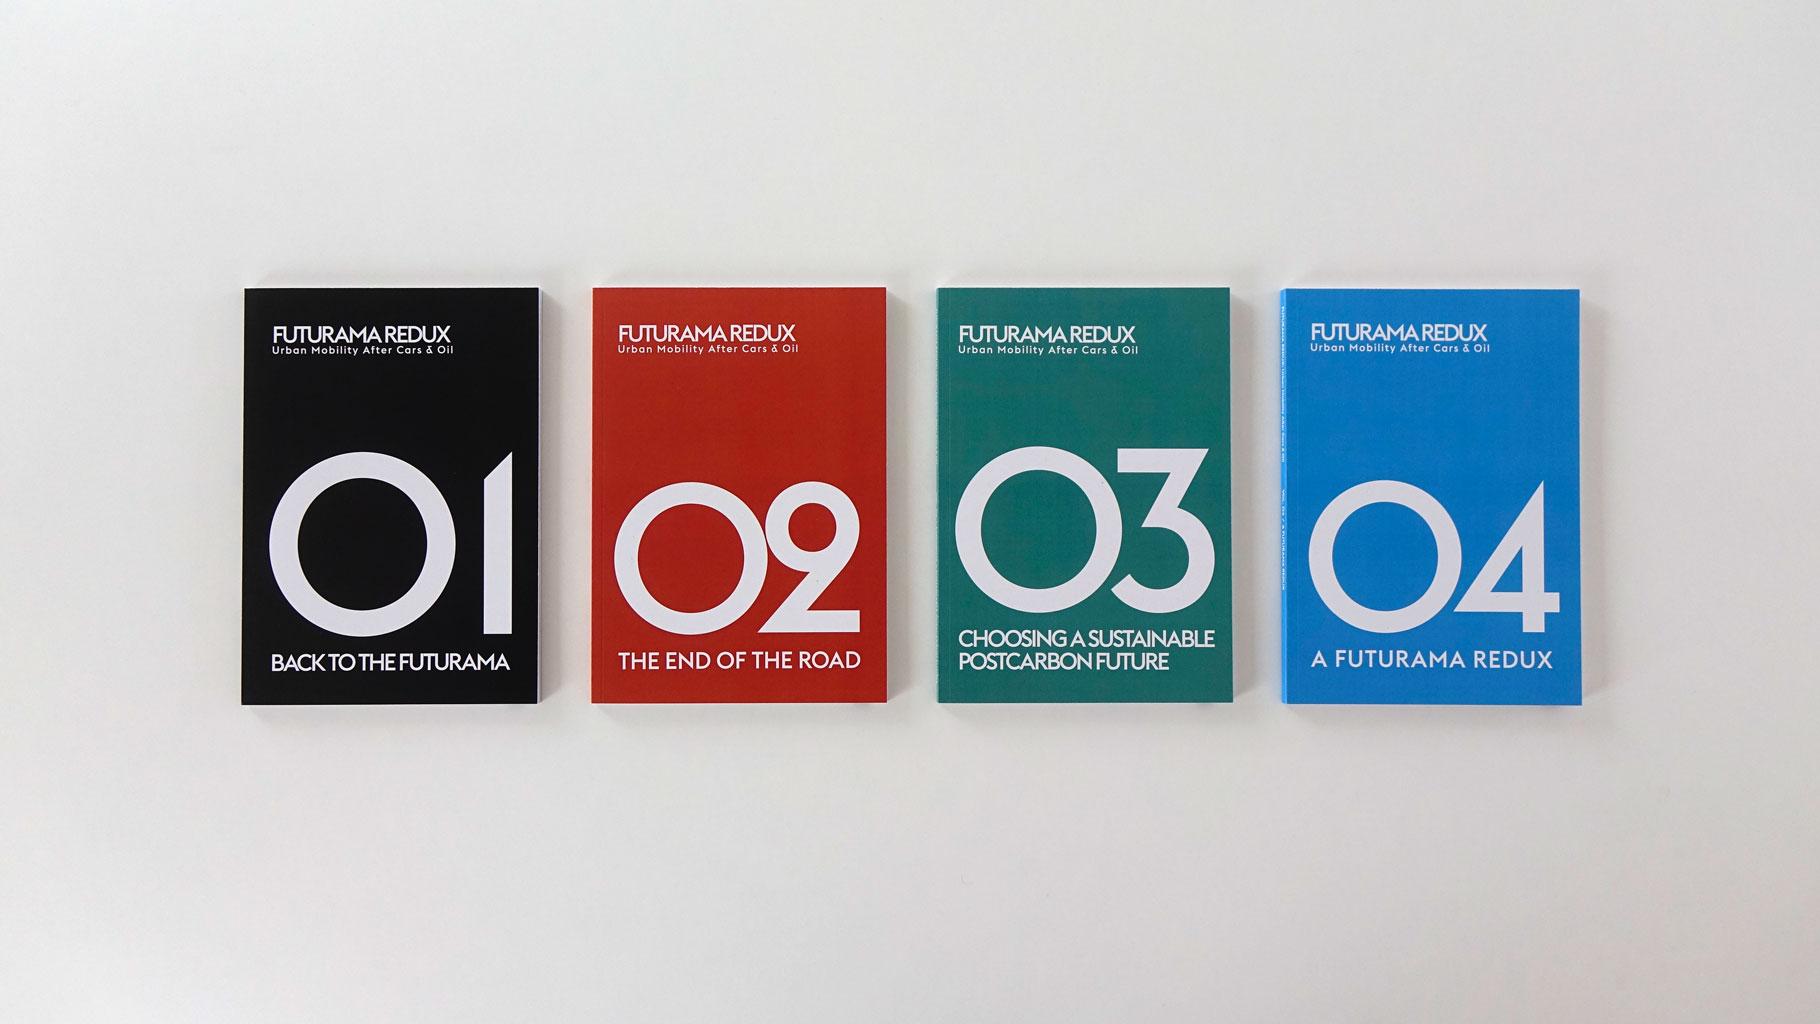 BANNER_Futurama-Redux_magazines_1